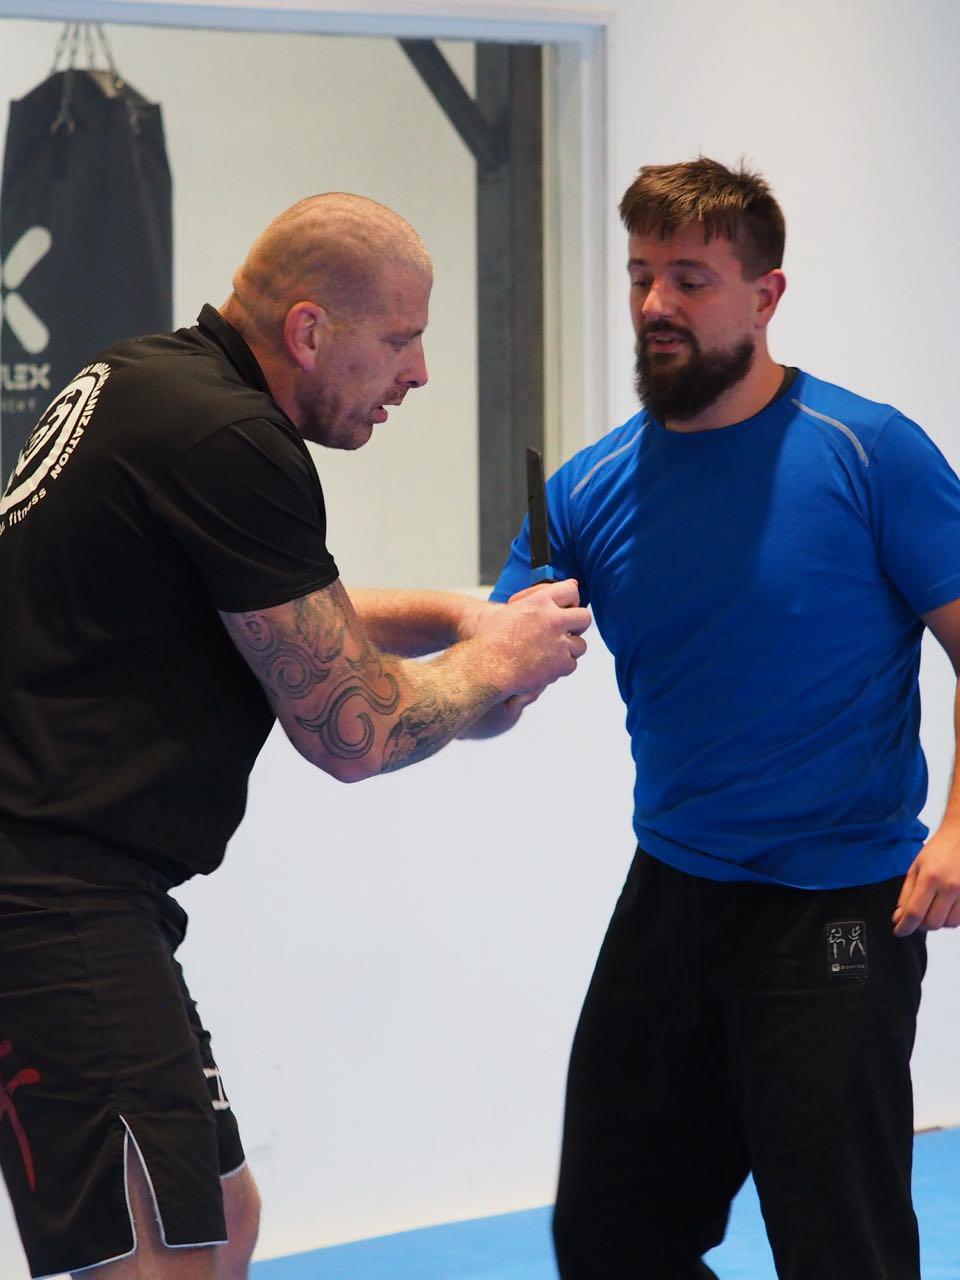 Krav Maga Trainer opleiding bij REFLEX Utrecht